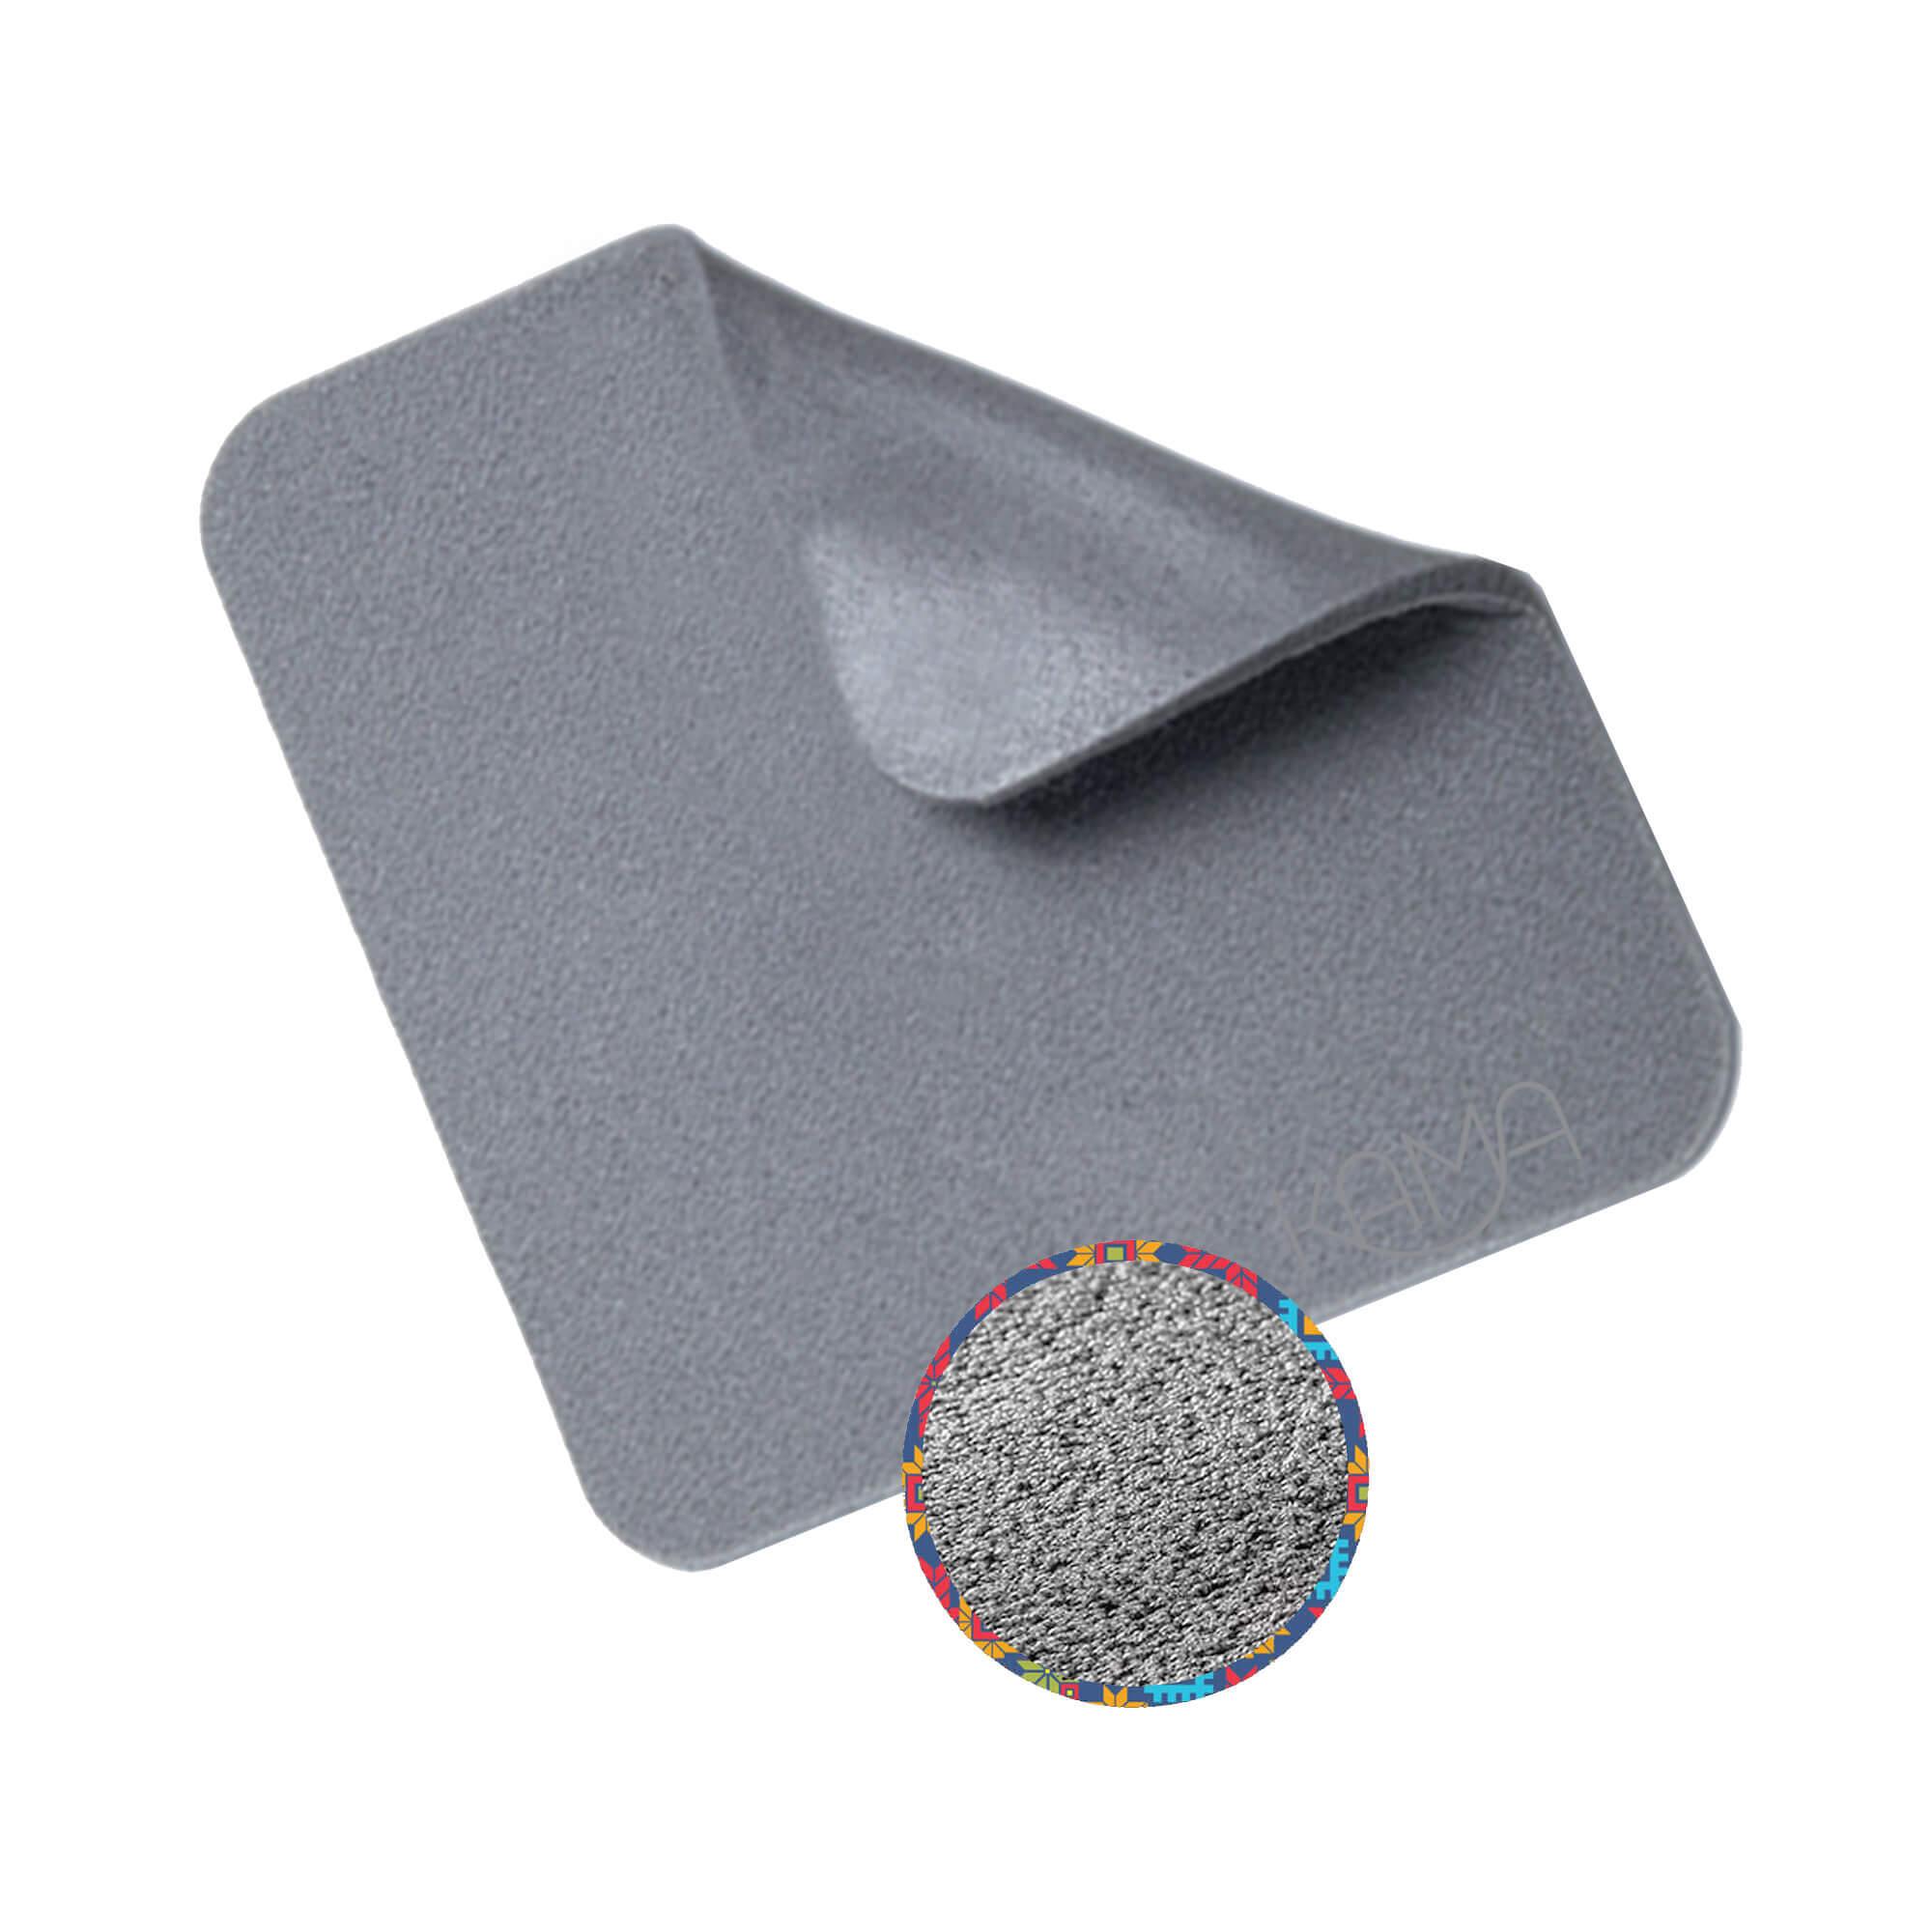 Повязка Мепилекс с серебром 15х15 см